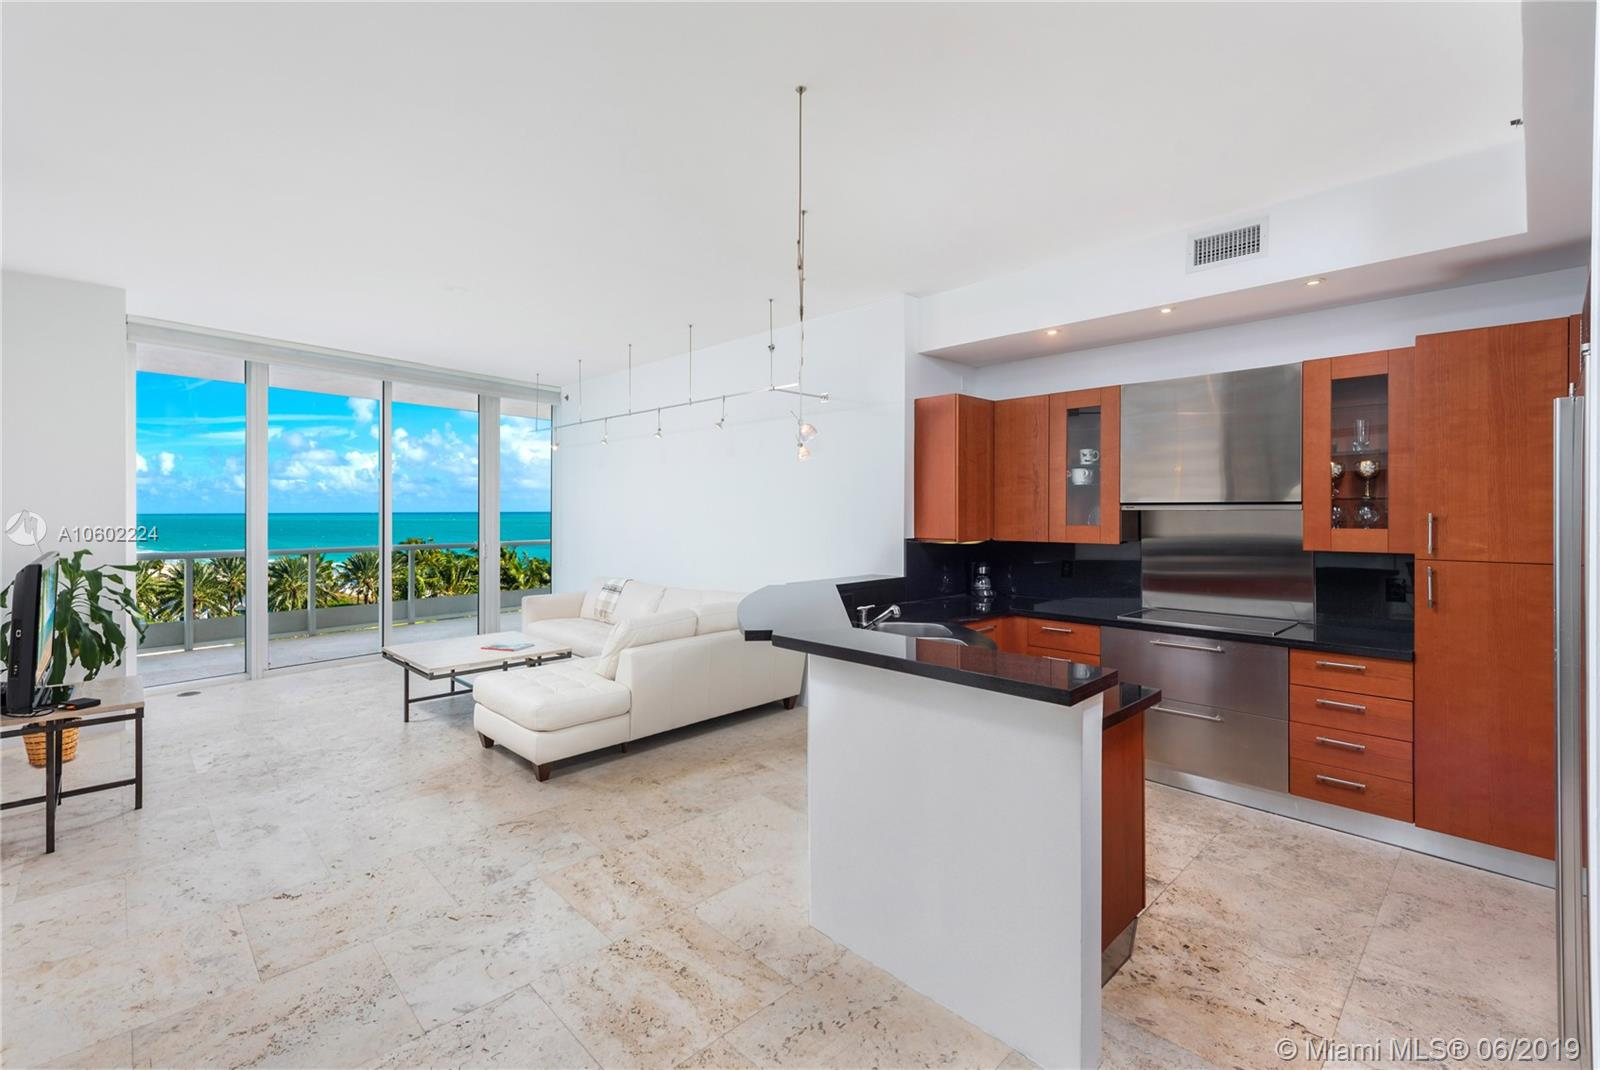 100 S Pointe Dr Miami Beach, FL 33139